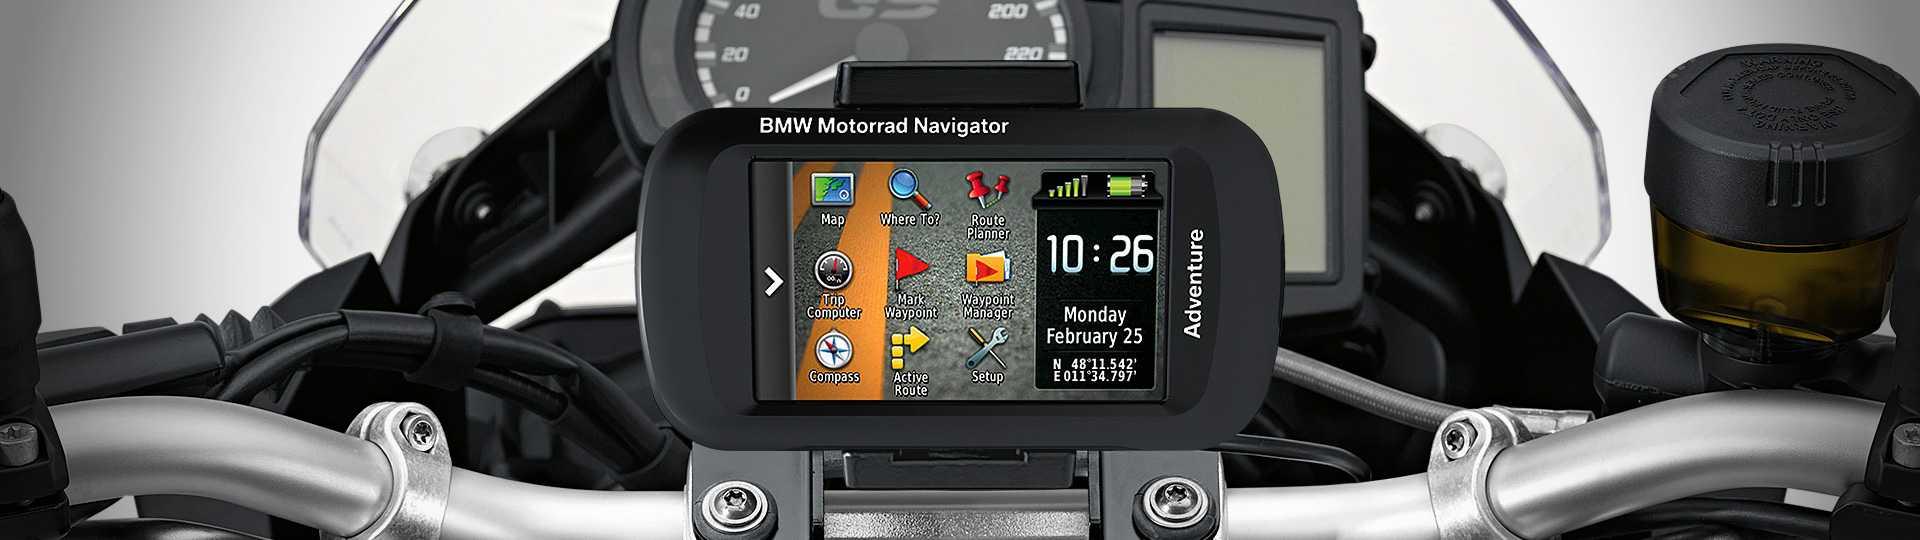 Система BMW Navigator VI